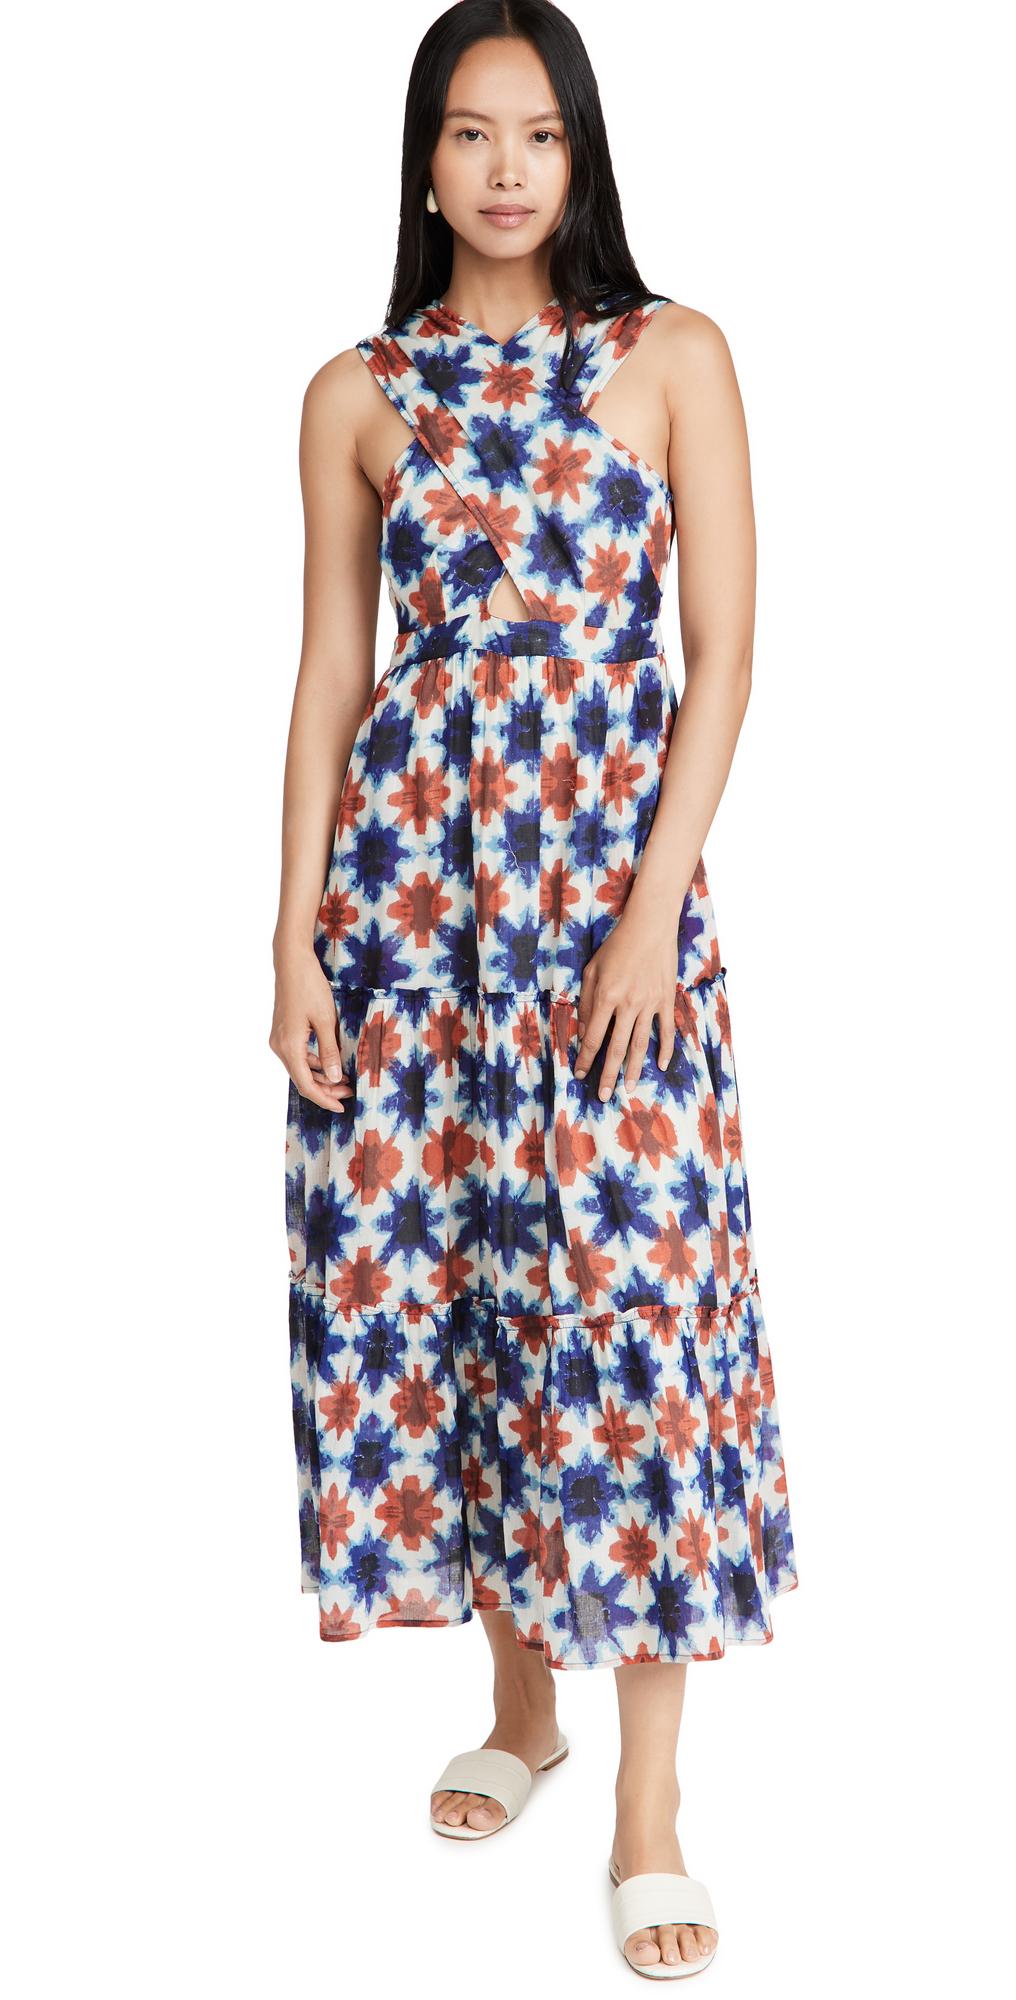 Harper Dress